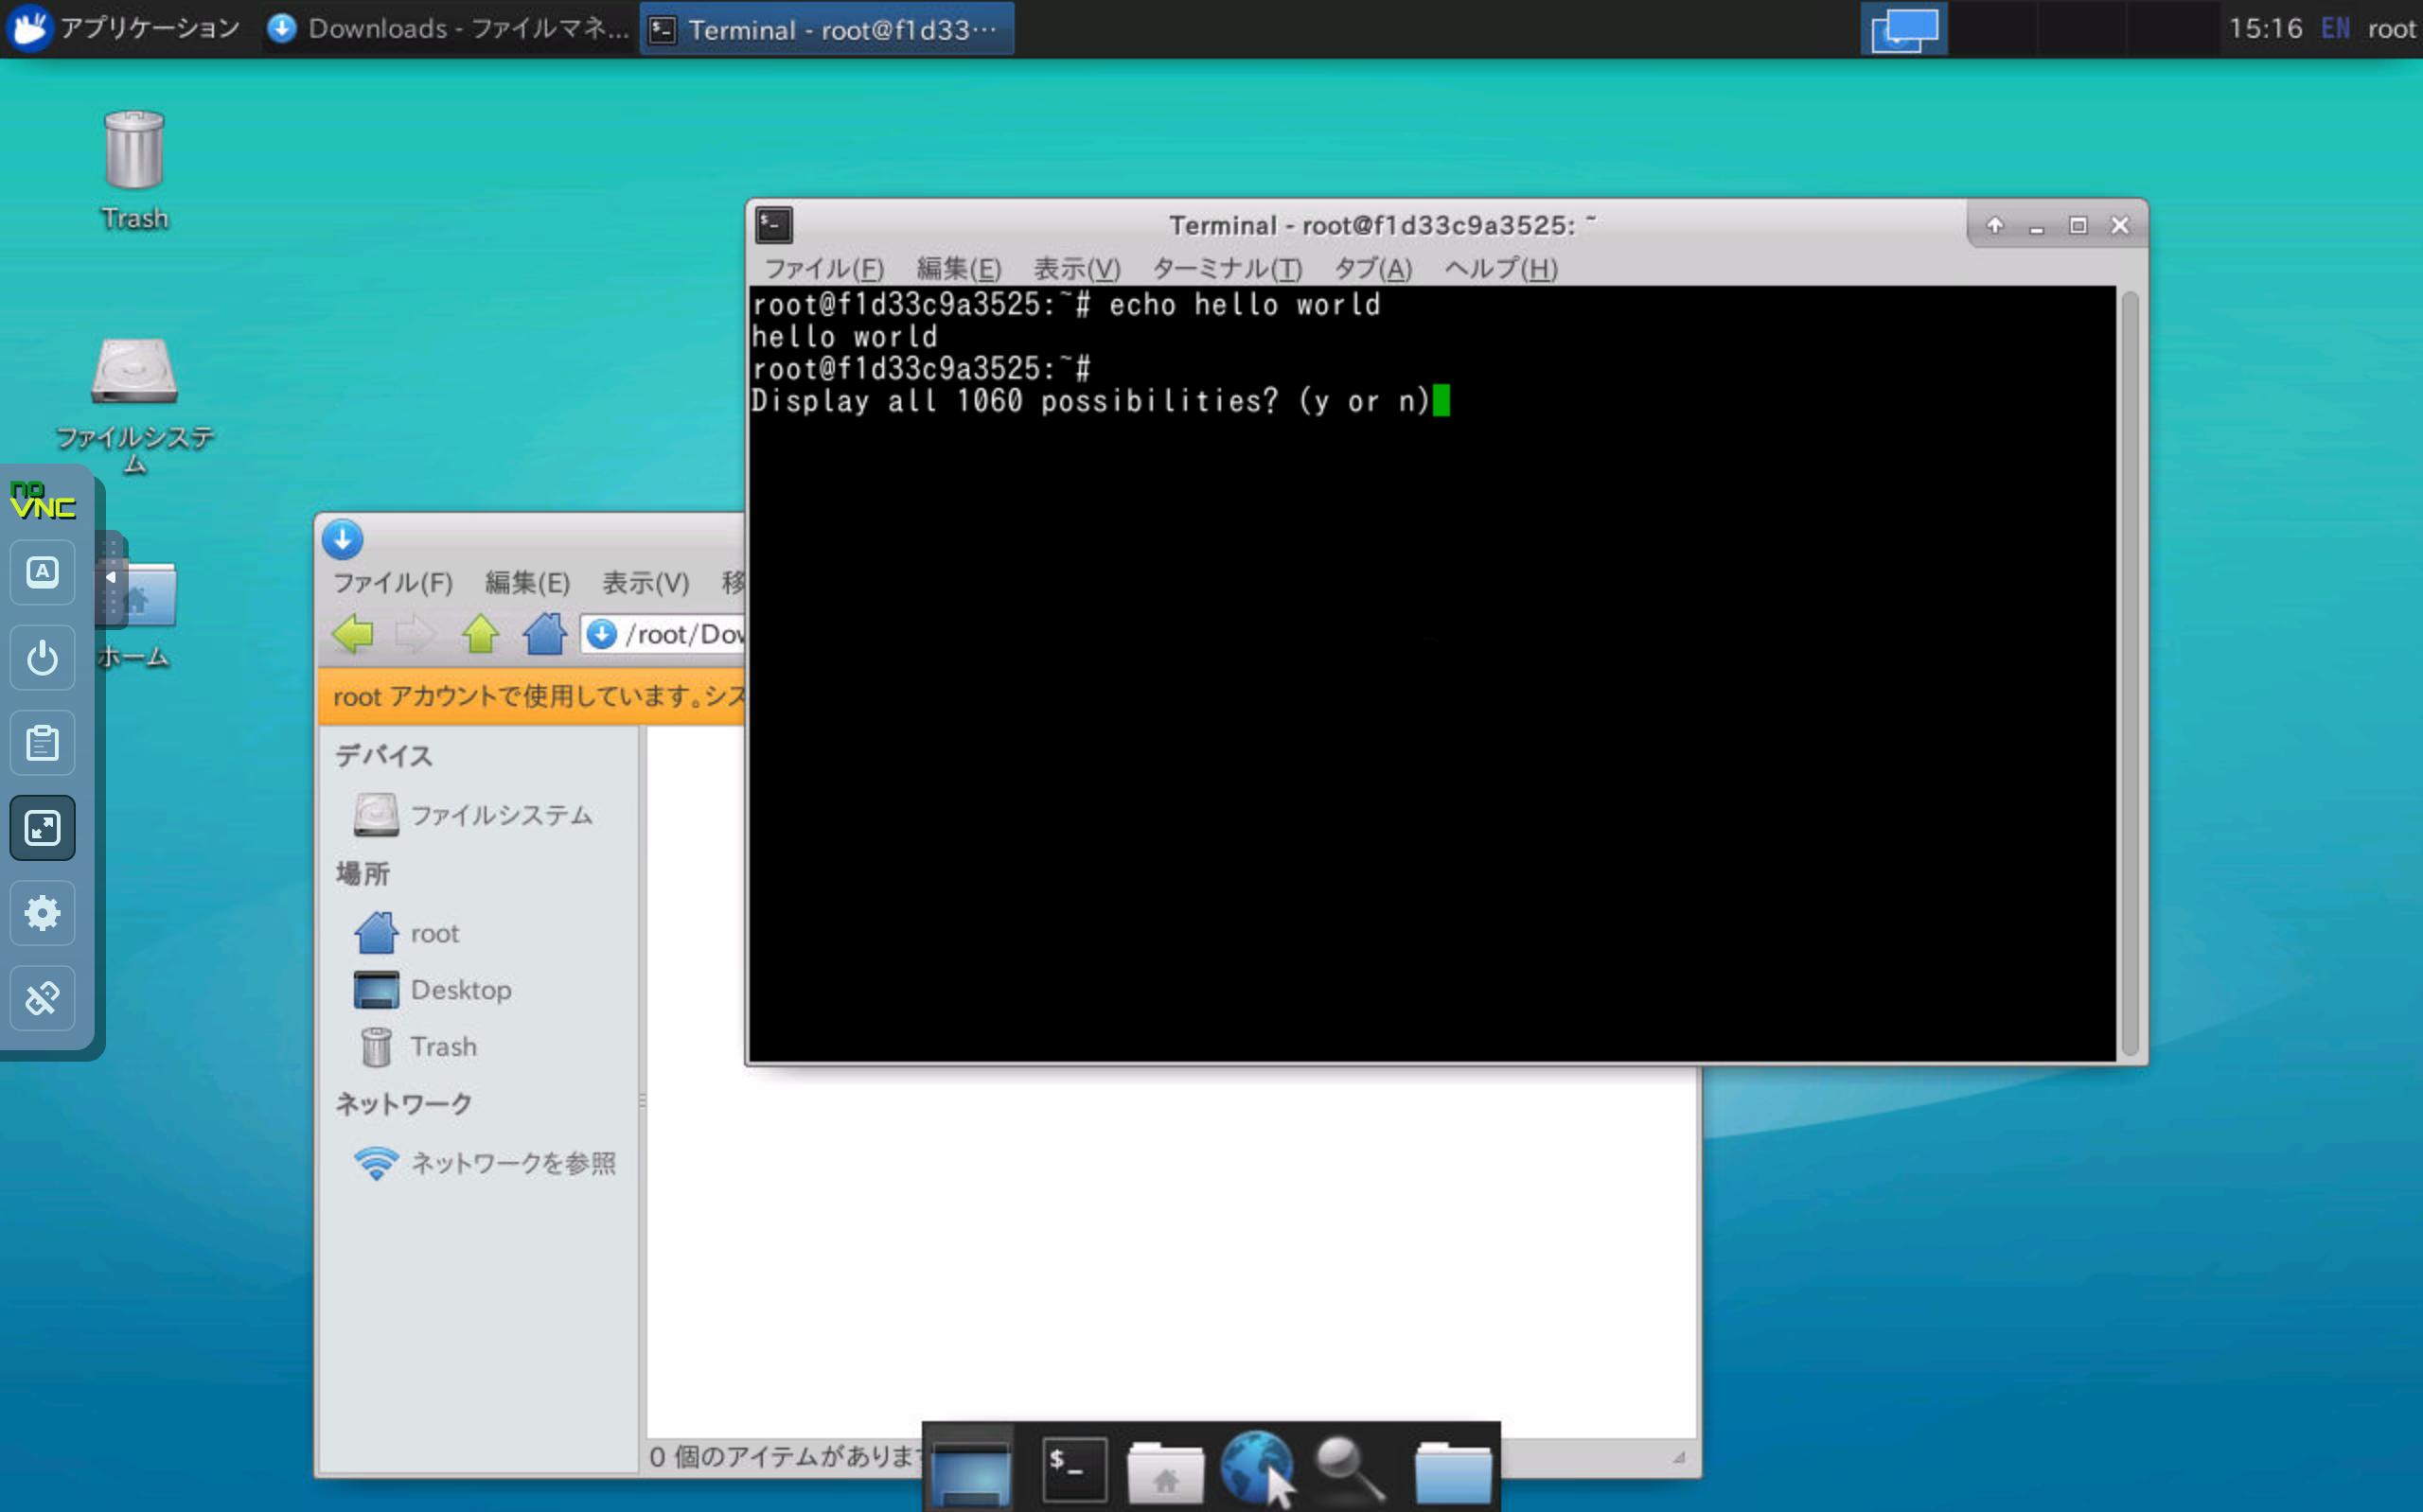 GitHub - uphy/ubuntu-desktop-jp: 日本人向けのUbuntuデスクトップ環境